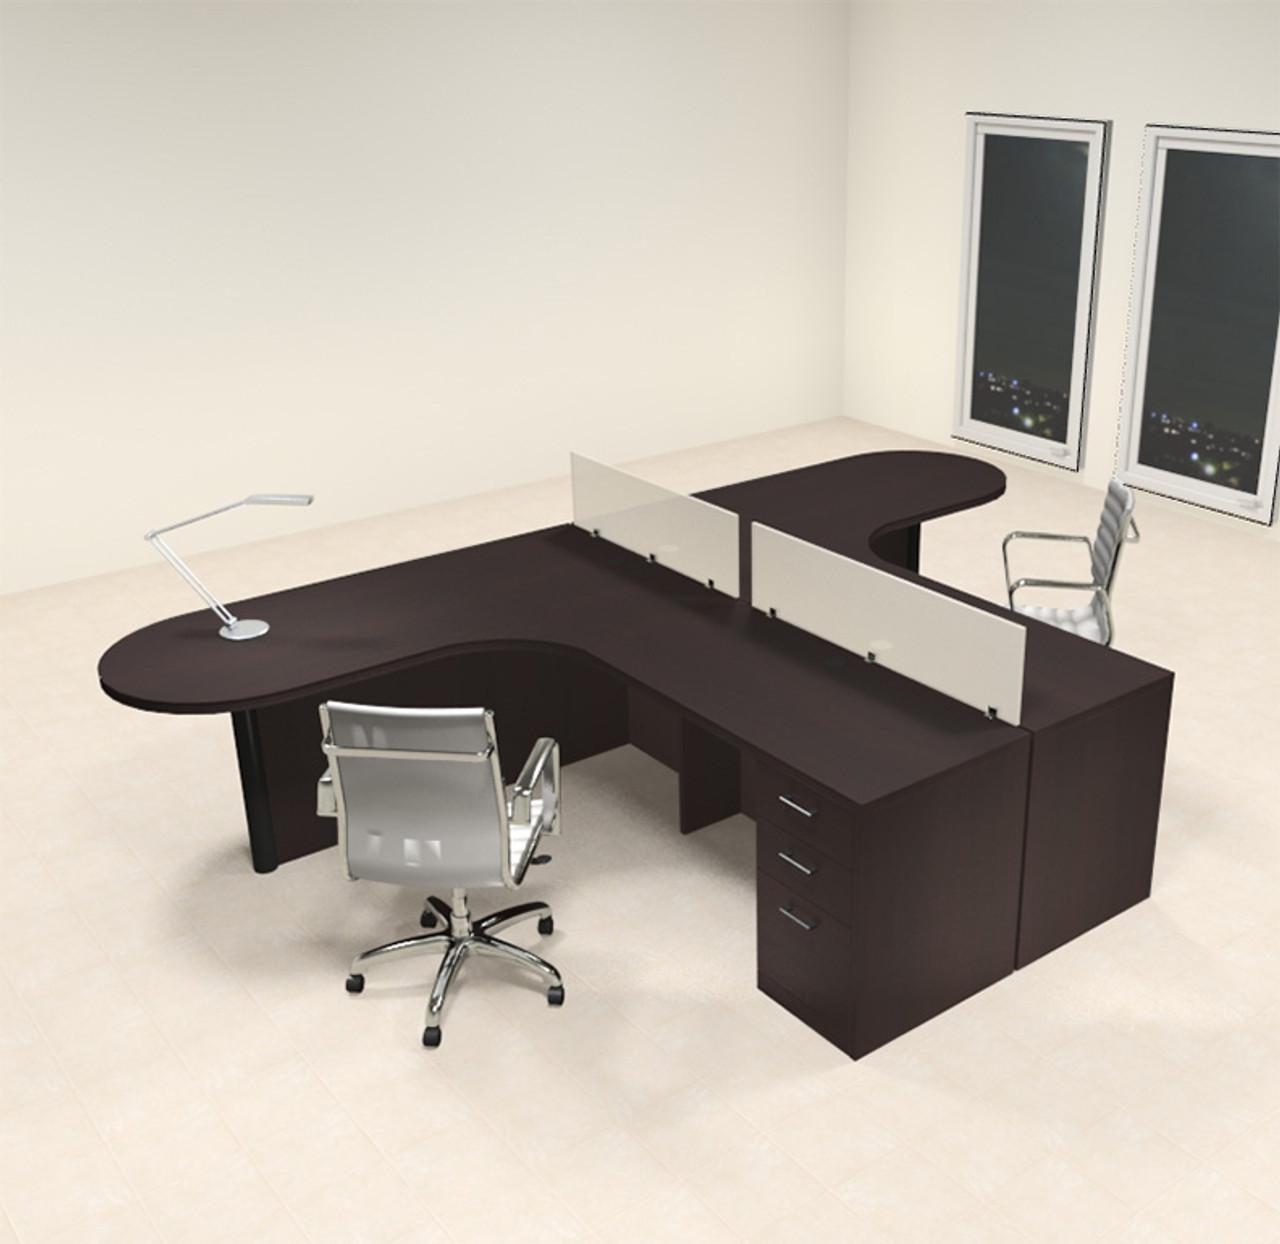 Two Person L Shaped Modern Divider Office Workstation Desk Set Ch Amb Sp2 Color4office